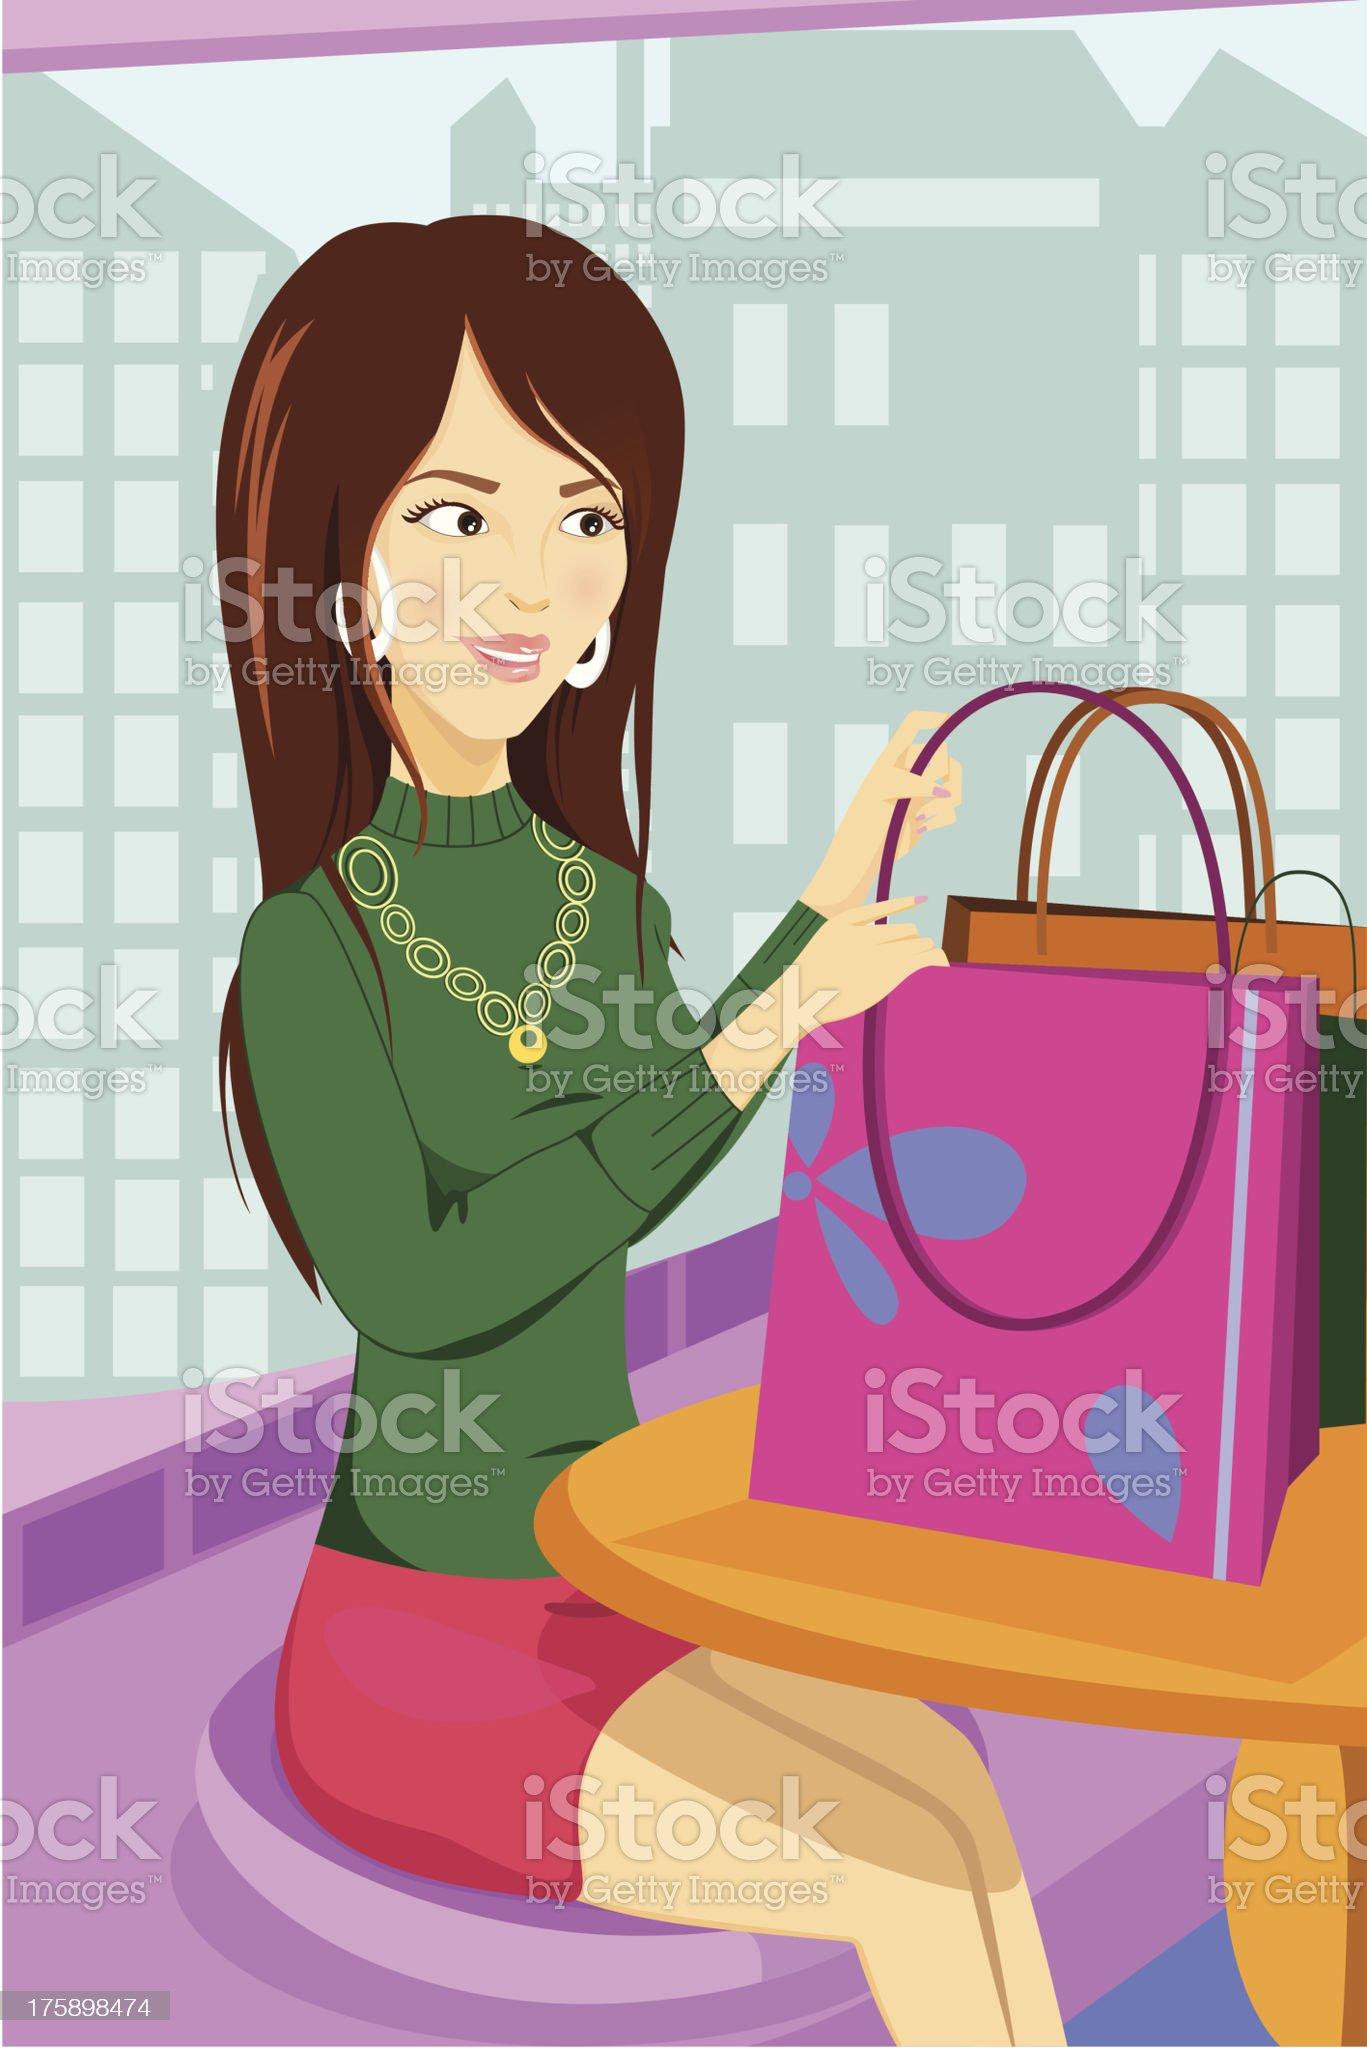 Shopping woman royalty-free stock vector art